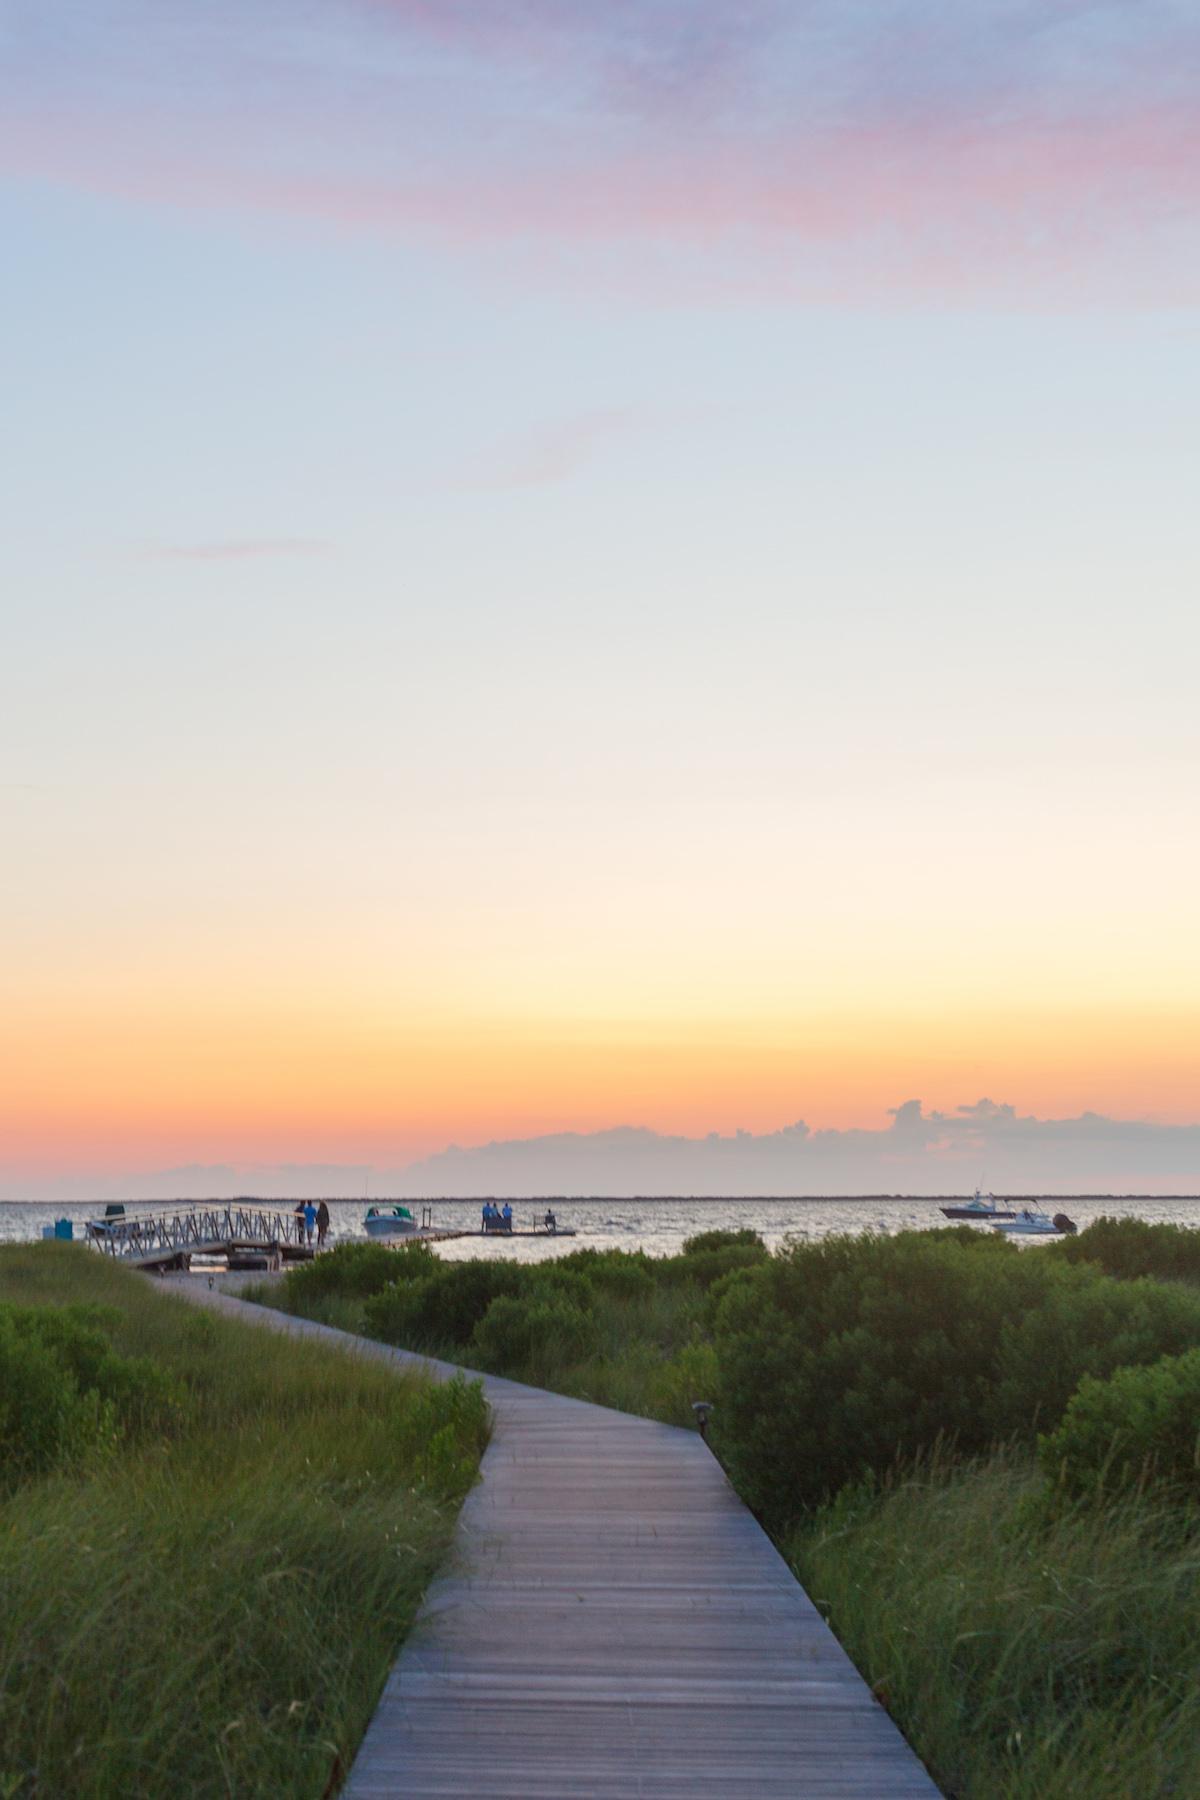 design darling sunset at topper's